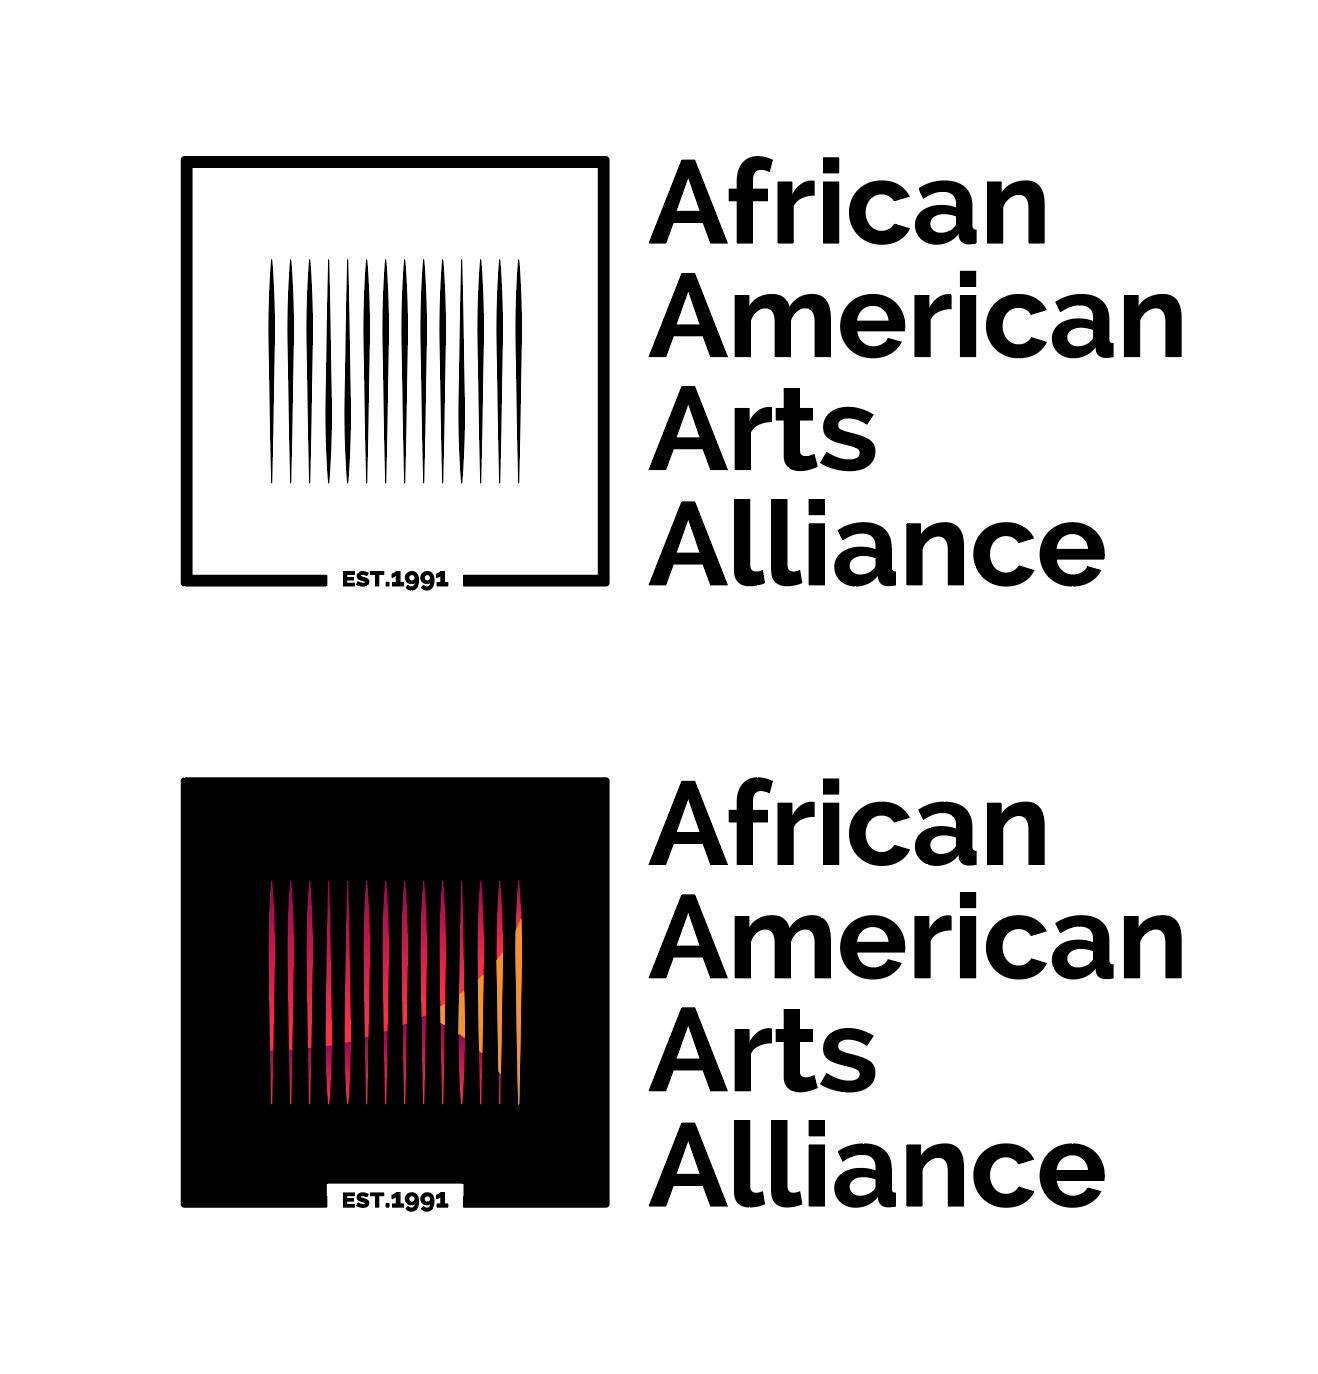 Identity and Branding